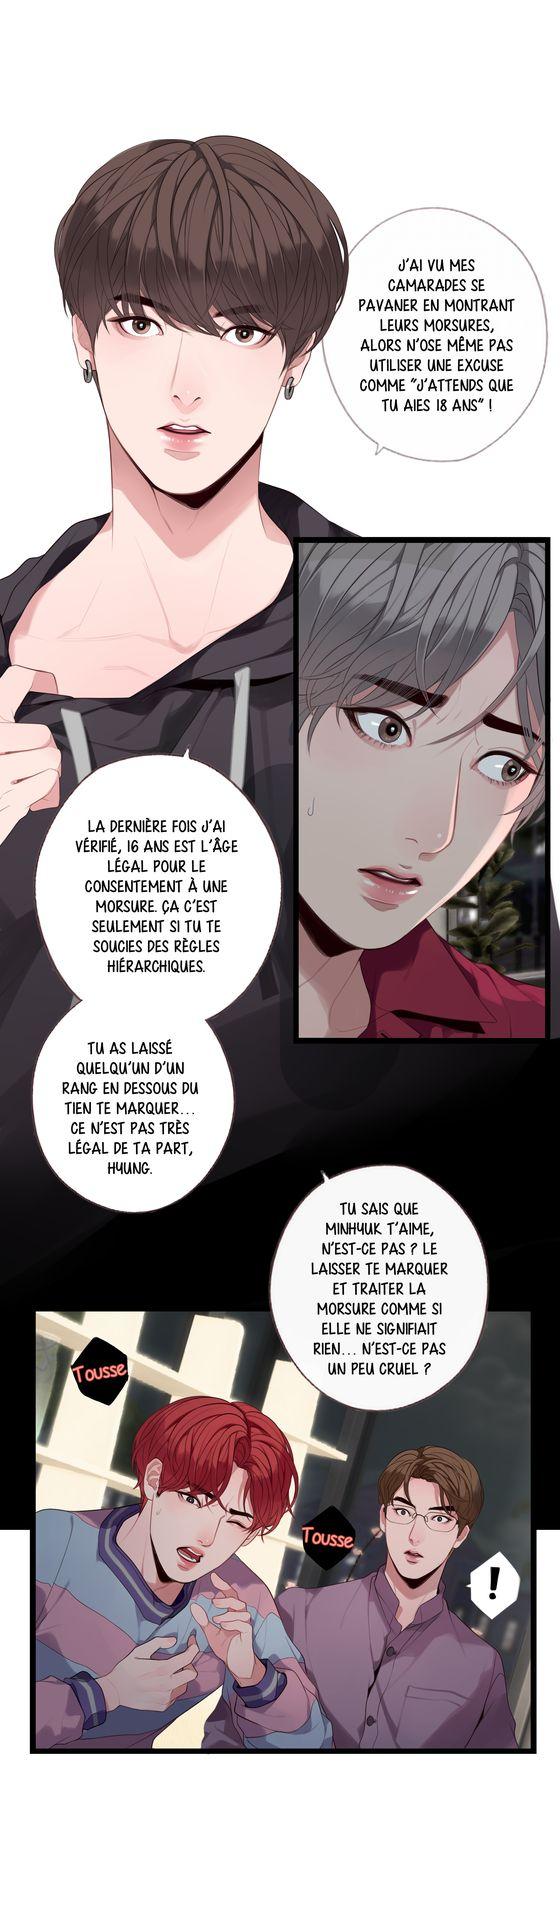 Notre Chef Oméga! Jinggyo Honnêteté in 2020 Anime